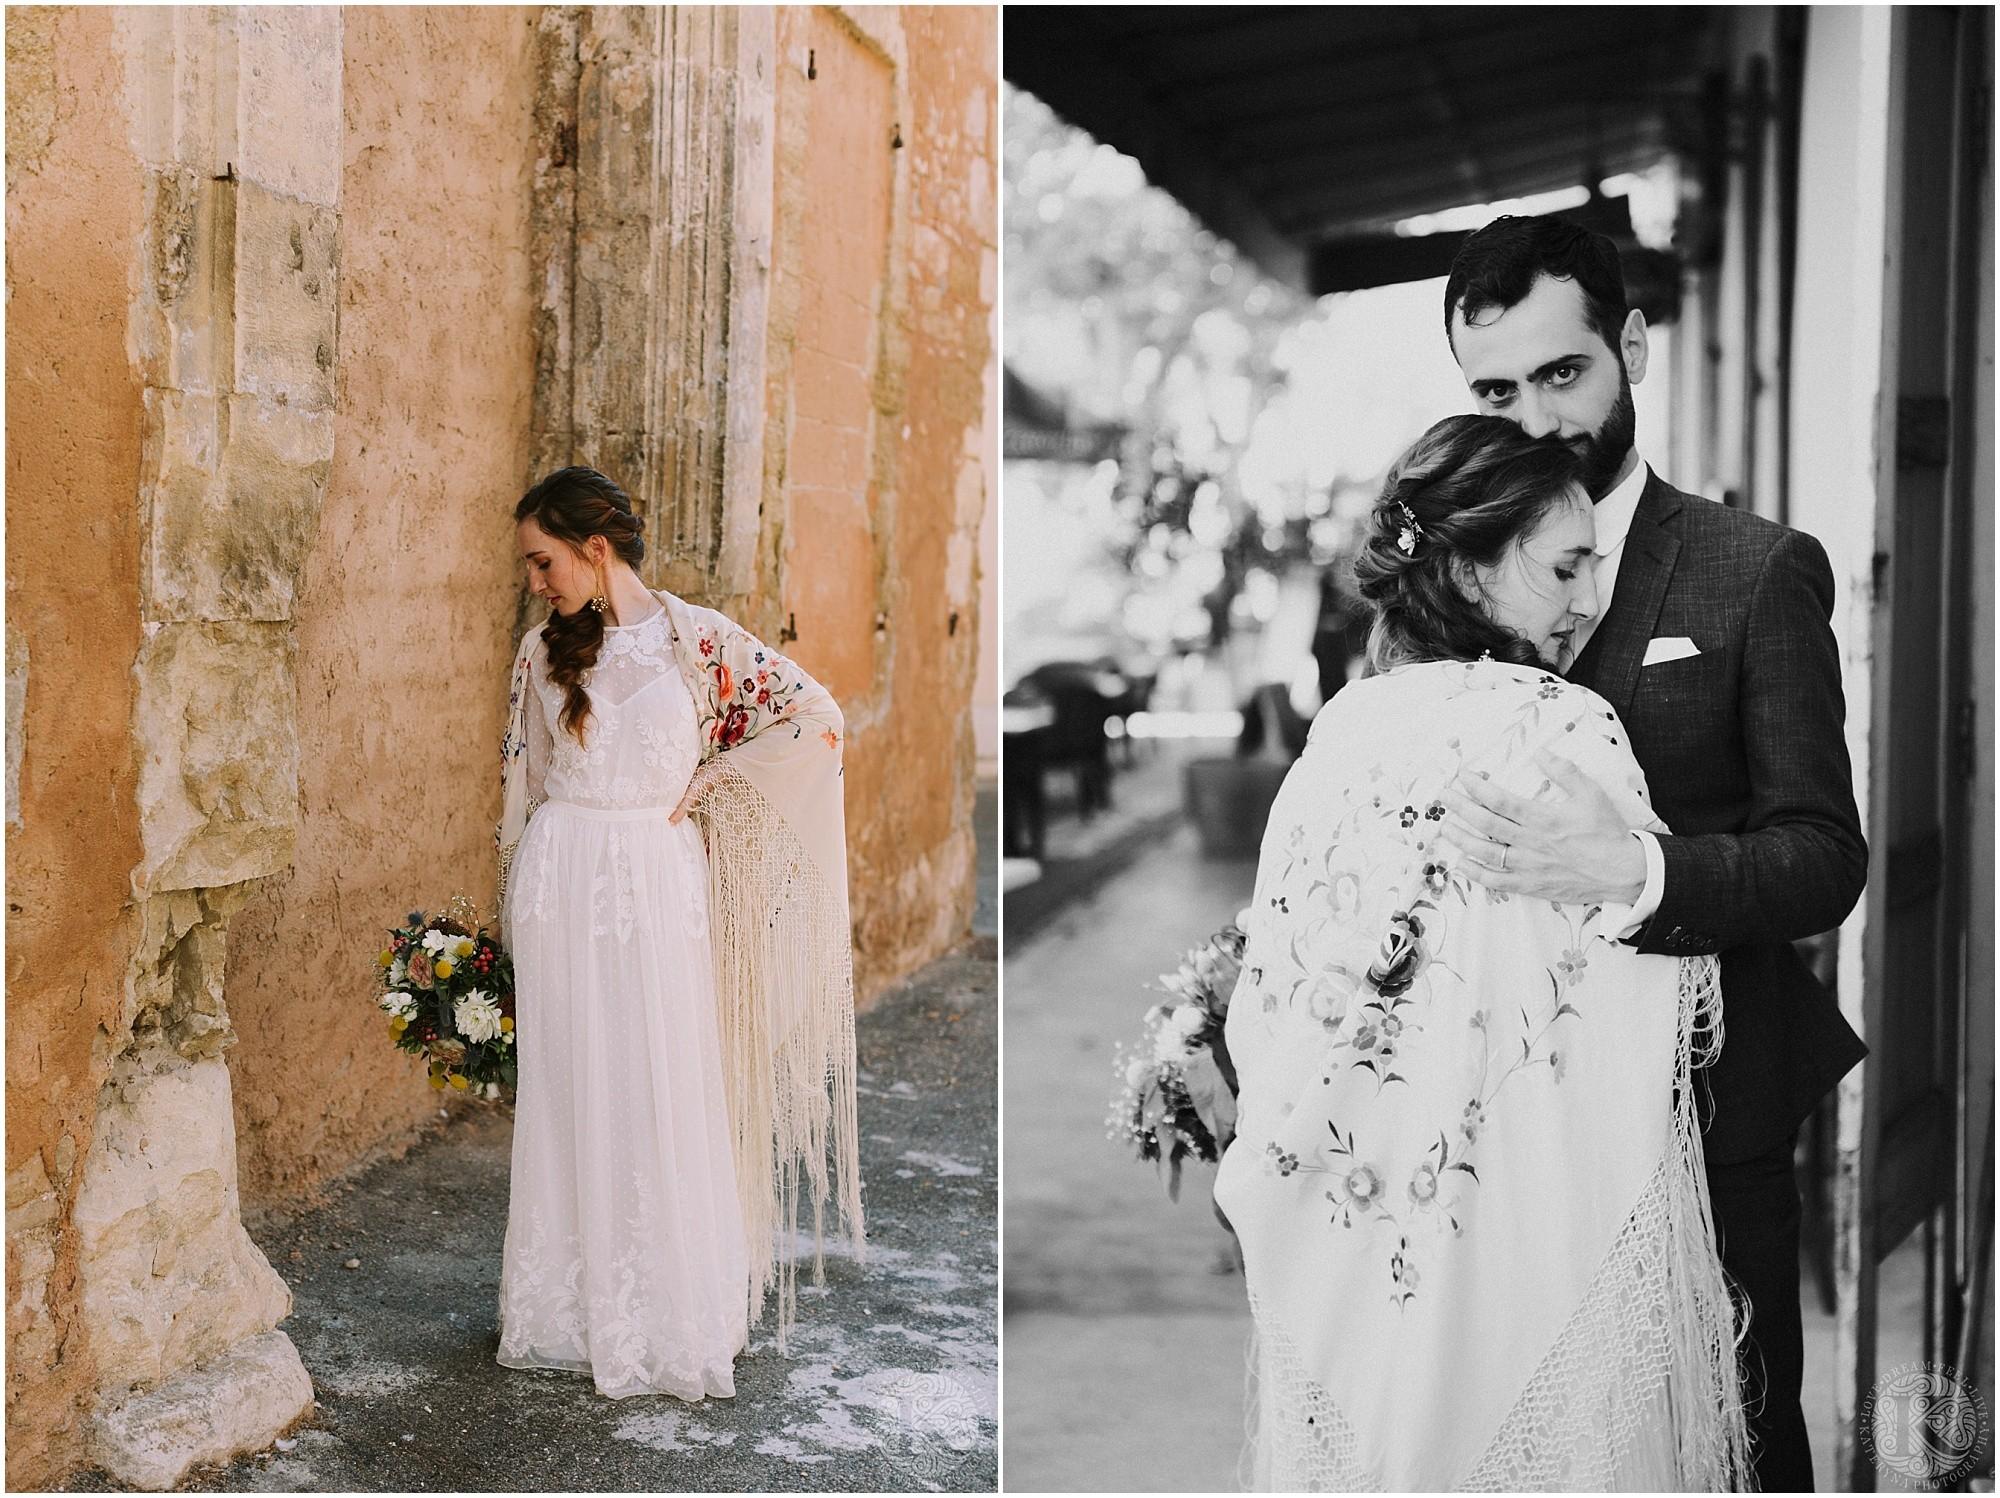 Kateryna-photos-photographe-mariage-vaucluse-provence-avignon-ferme-st-hugues_0055.jpg